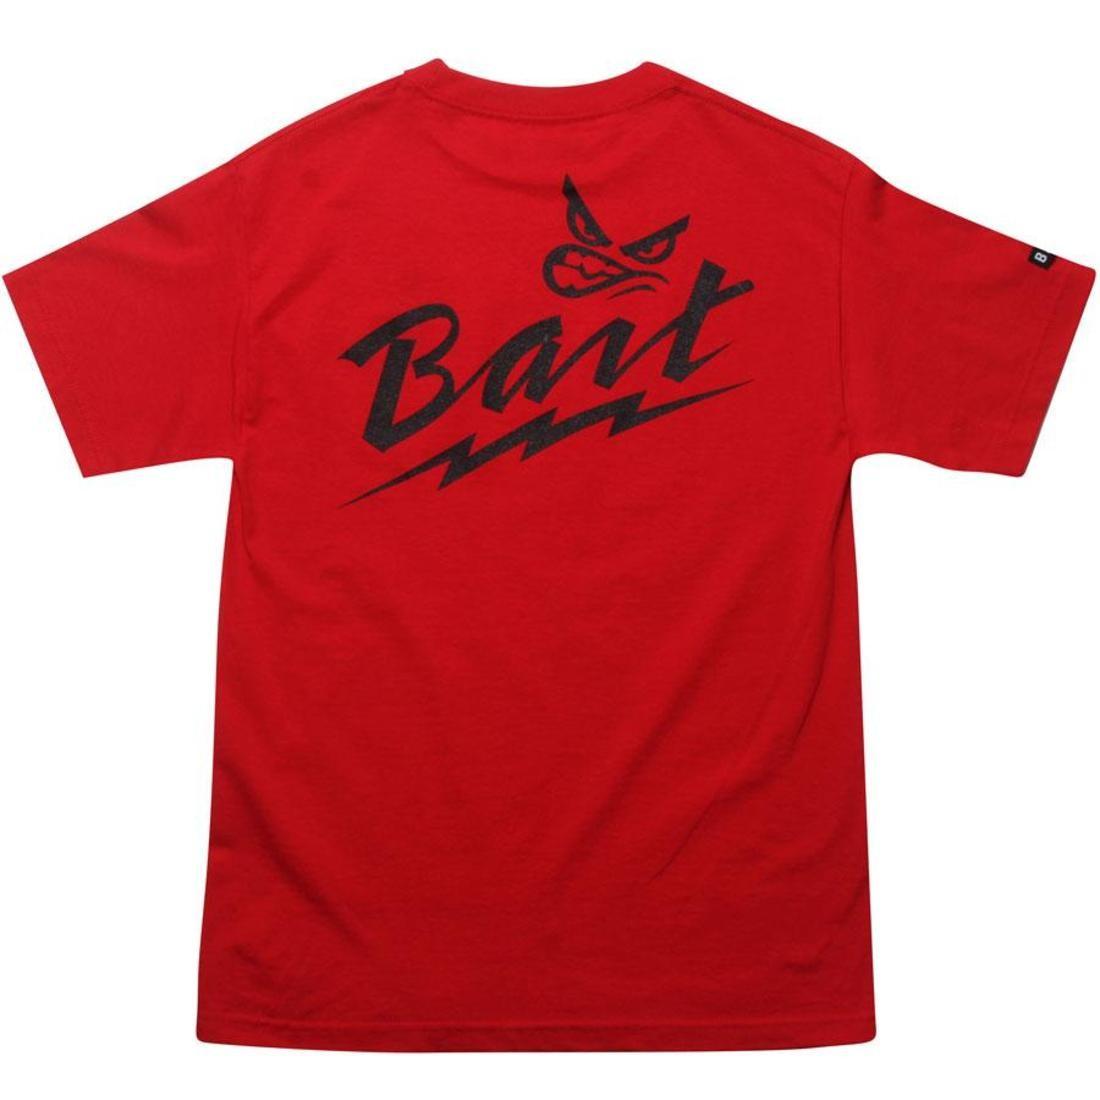 BAIT Attitude Tee (red)